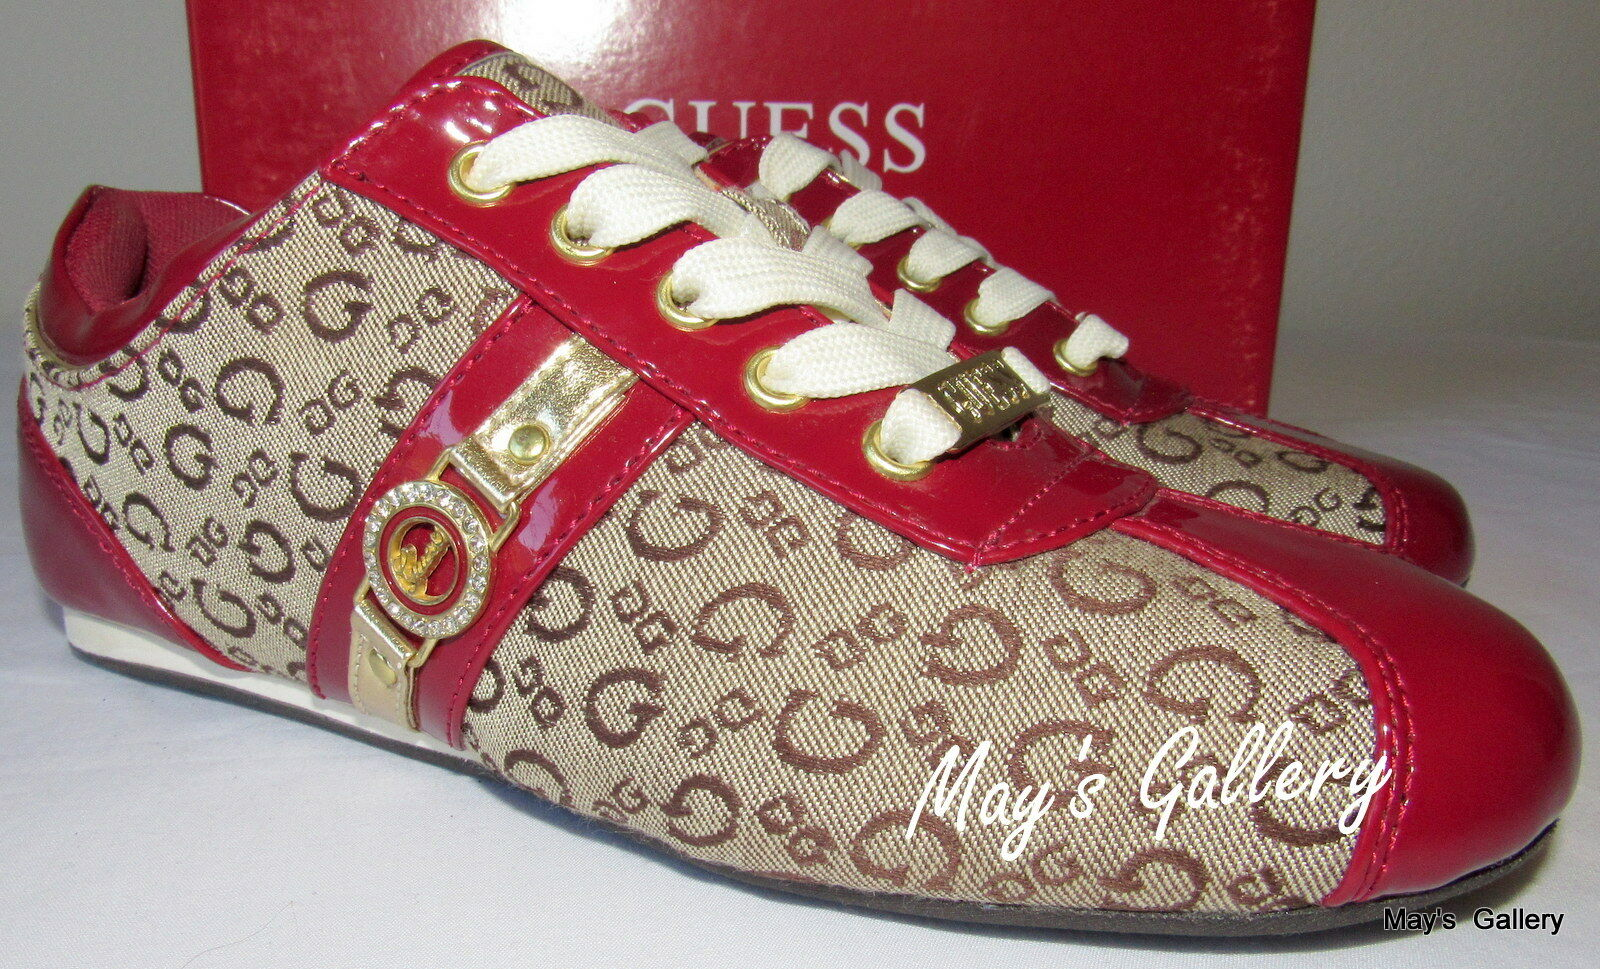 GUESS Sneaker Tennis Sport  Athletic   Walking Chaussures Chaussures Flip Flop NIB Sz  6